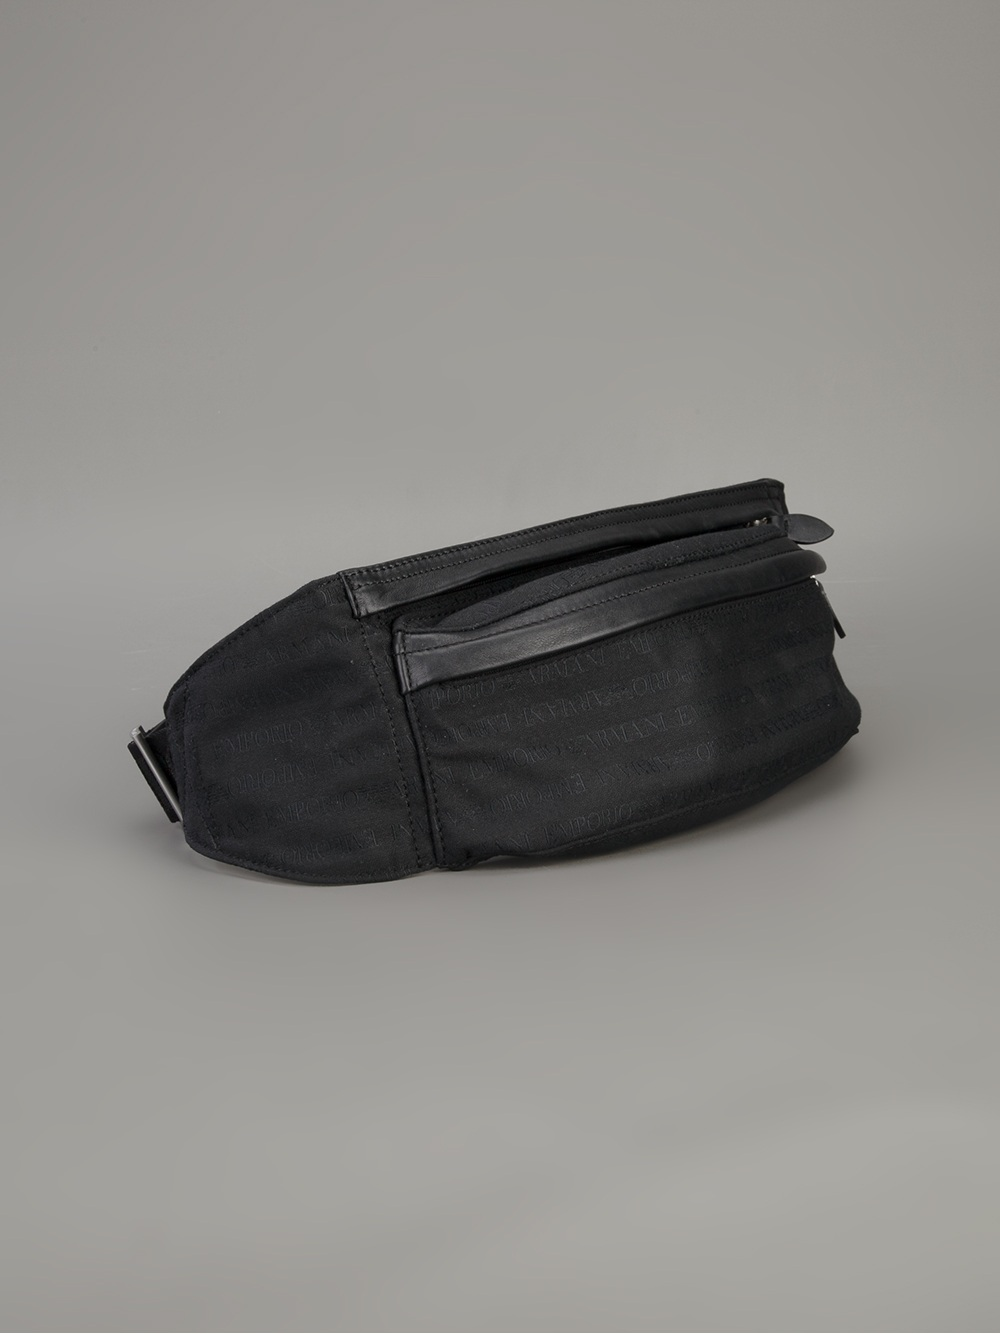 Emporio Armani Zip Pouch Bum Bag in Black for Men - Lyst e4b1c7499d757